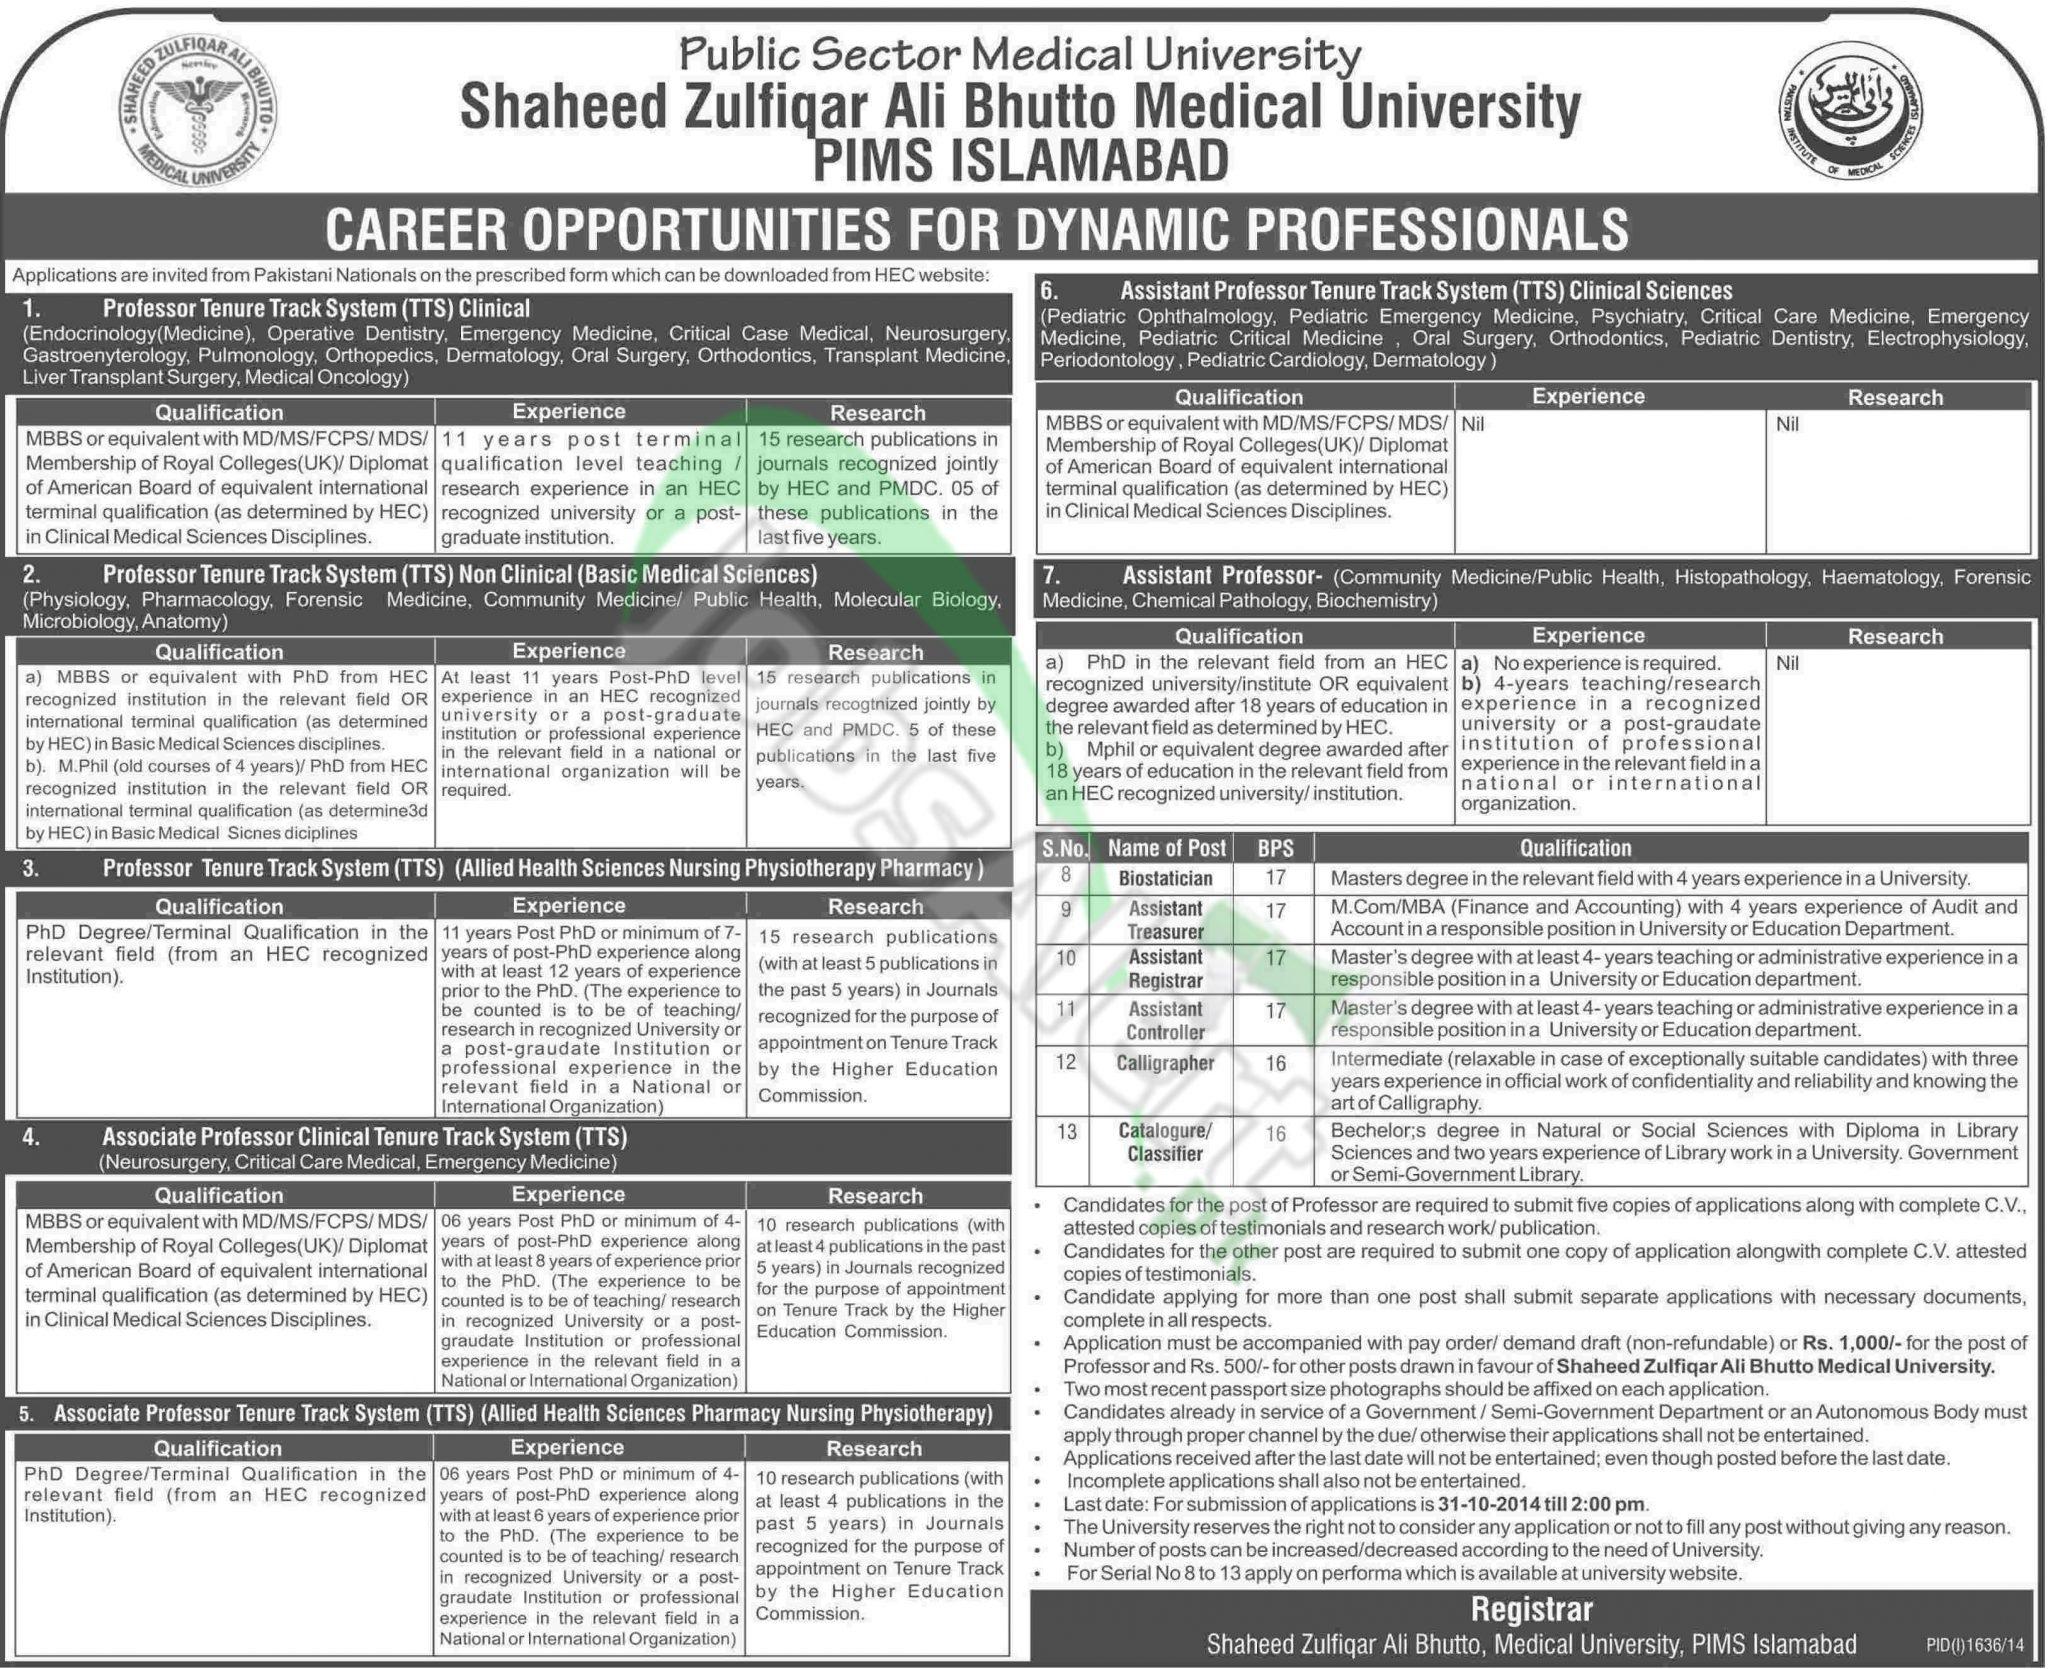 Shaheed Zulfiqar Bhutto Medical University and PIMS Islamabad